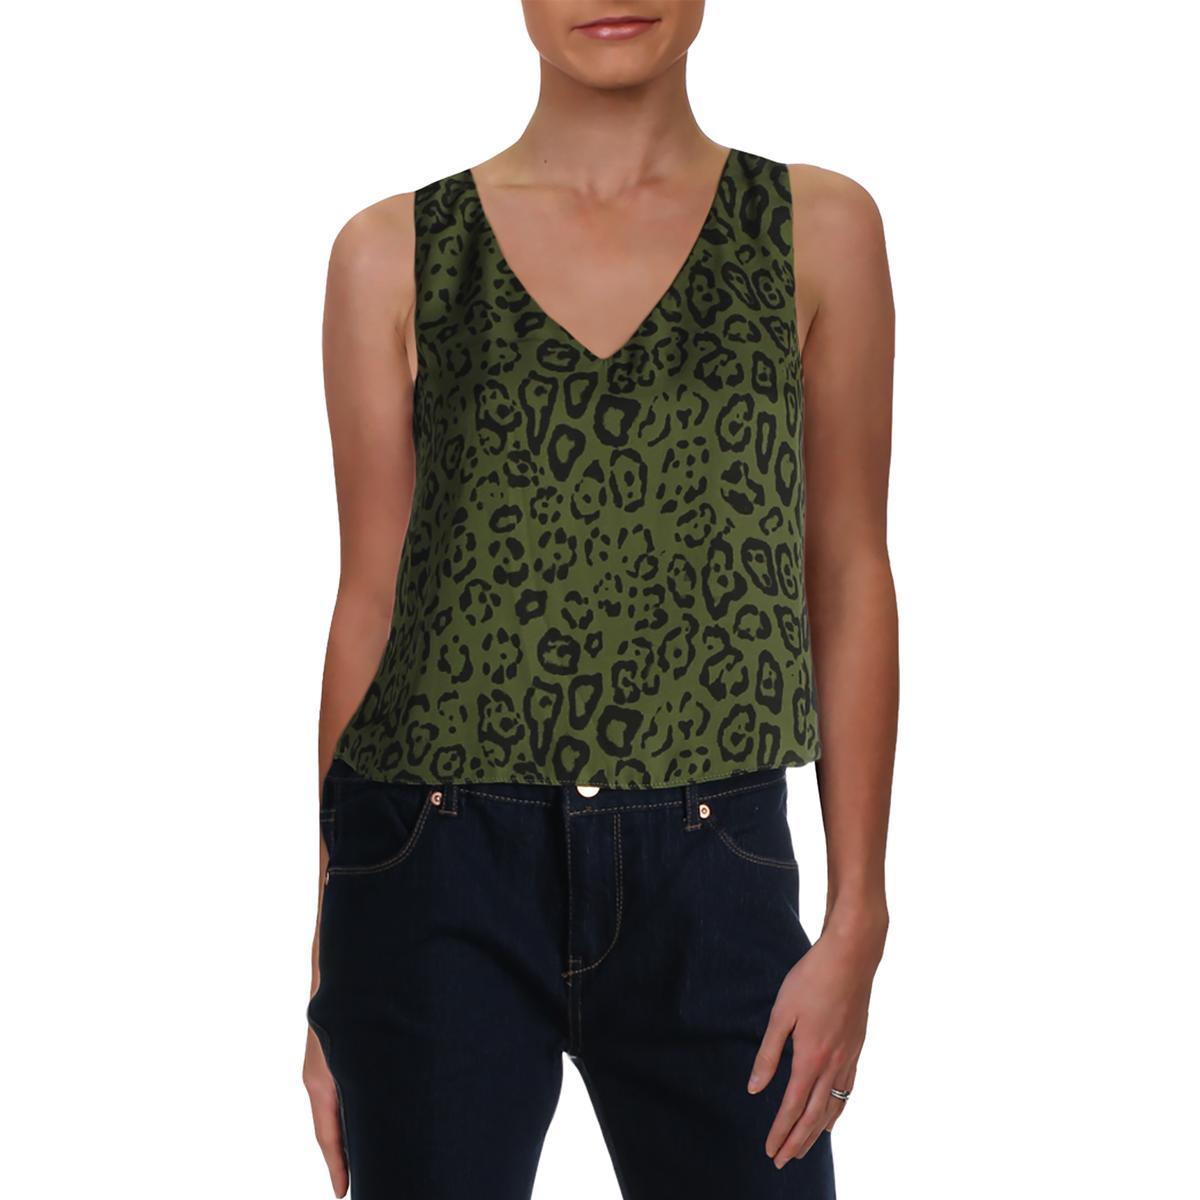 BCBGeneration Womens Green Animal Print Bell Sleeve Wrap Top Shirt XS BHFO 8736